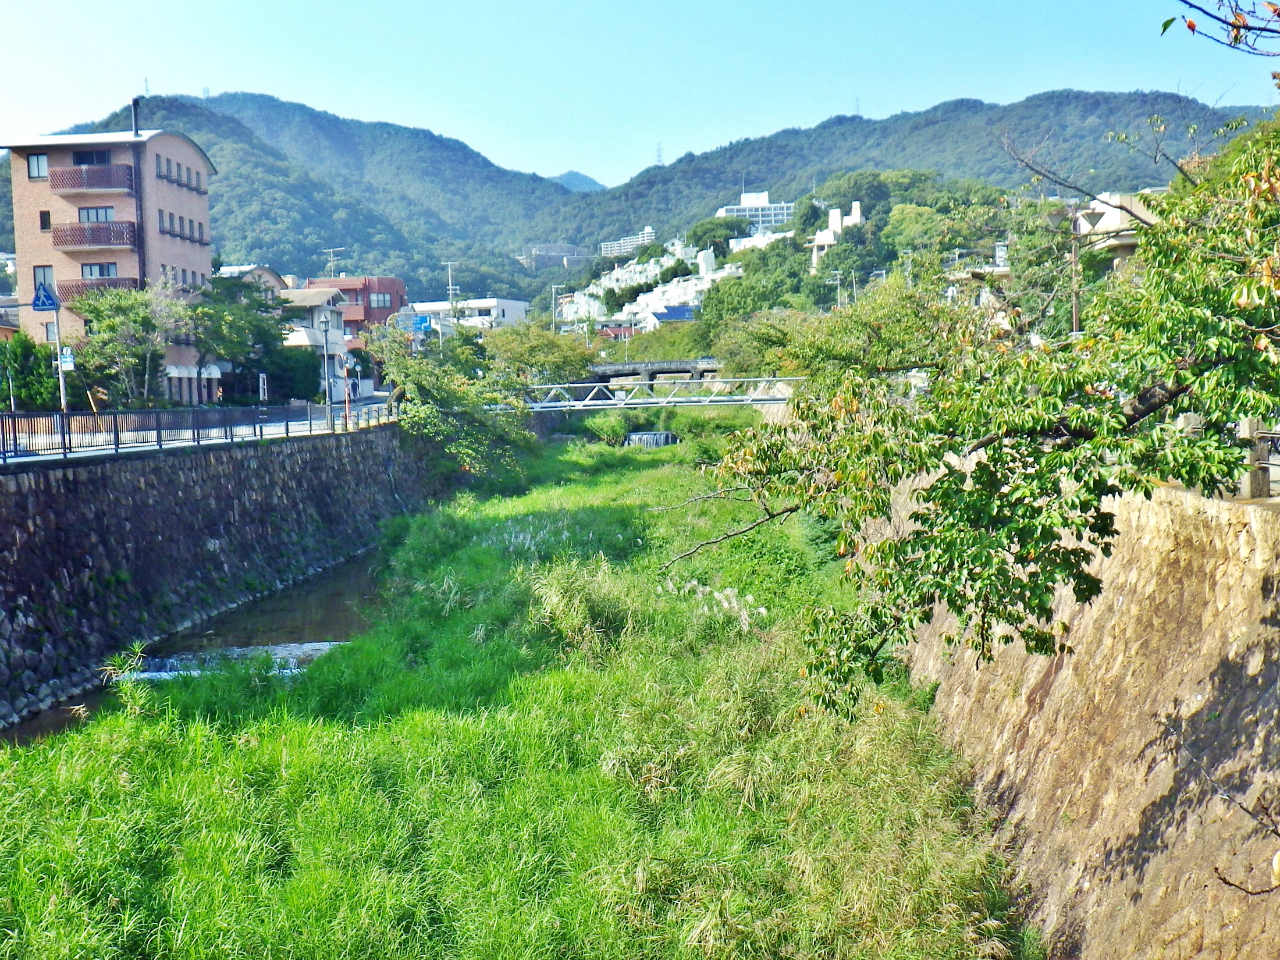 27a 芦屋川から振り返る